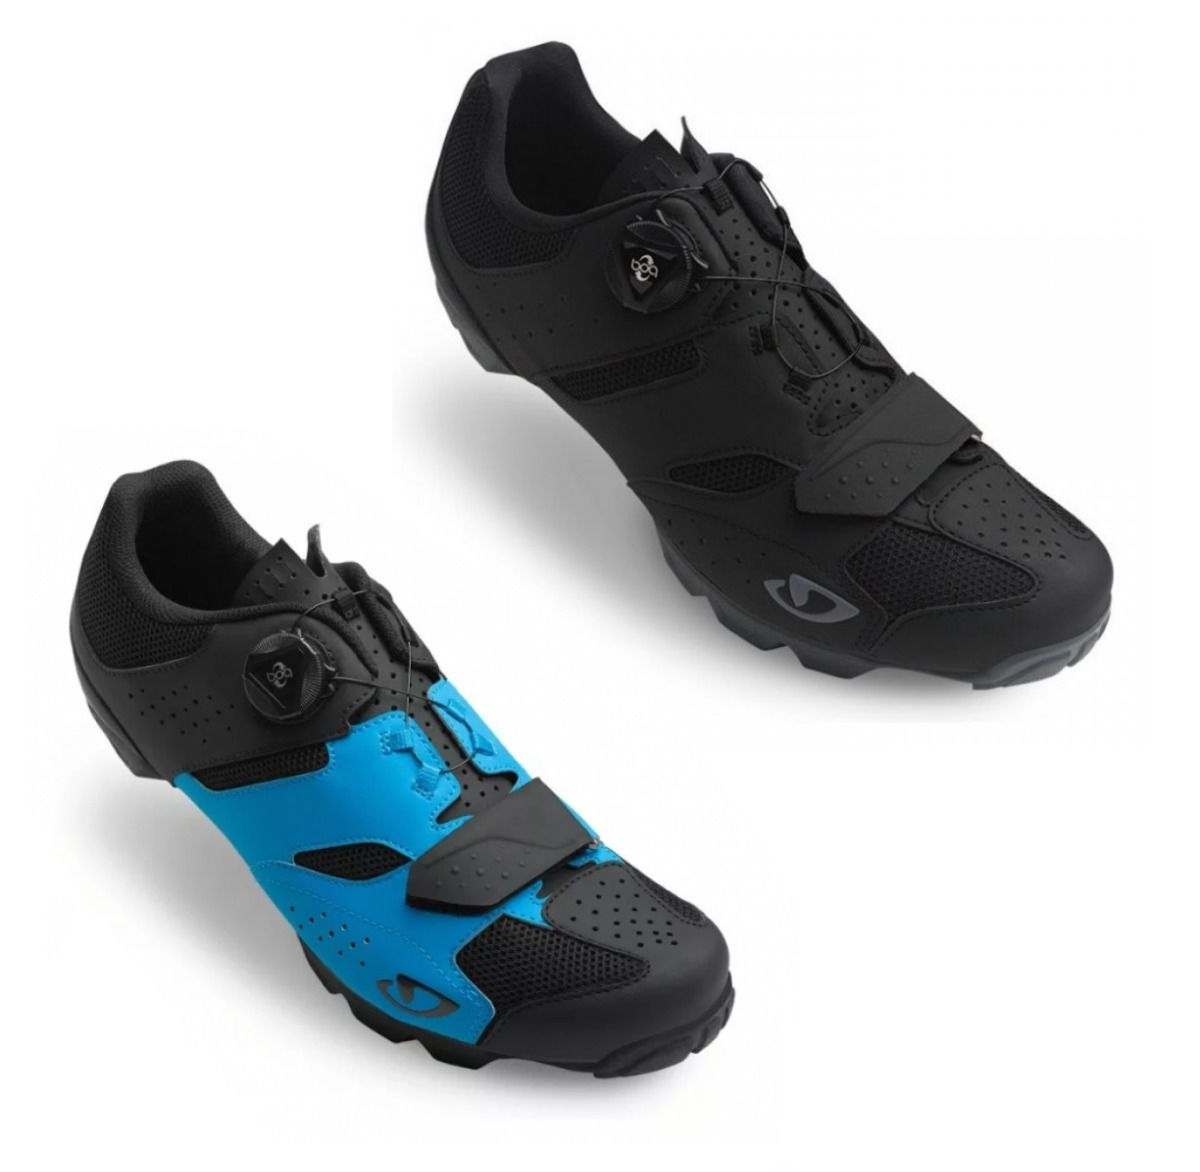 Sapatilha Ciclismo Bike Giro Cylinder Boa Mtb Preta Azul T40